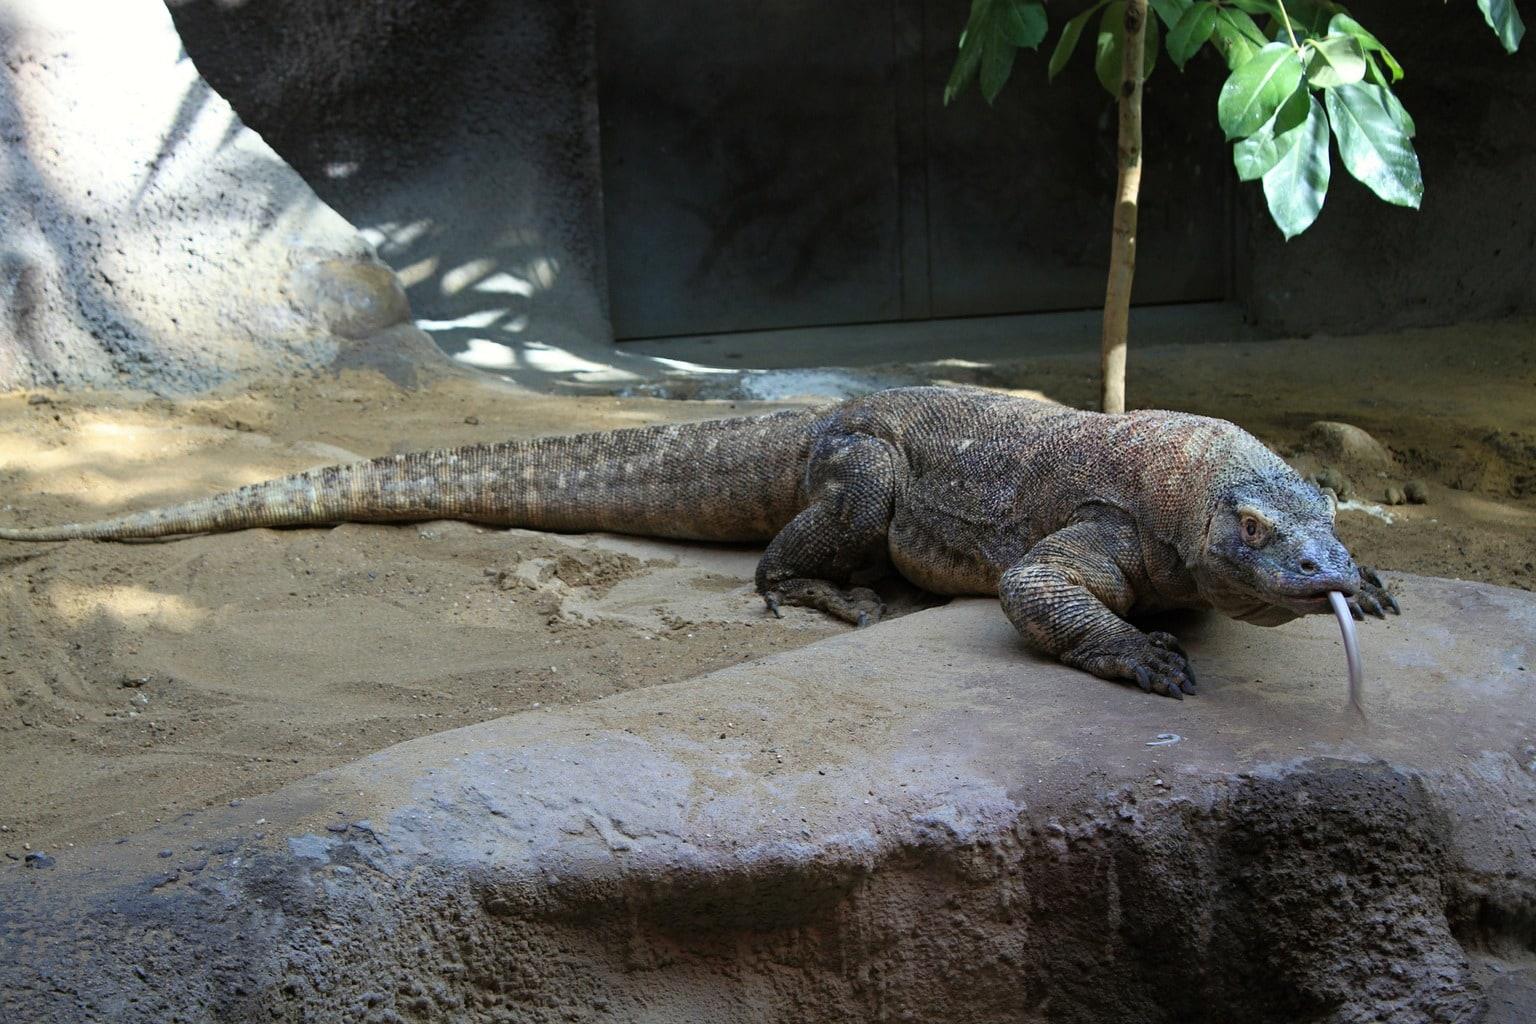 The Komodo Dragon